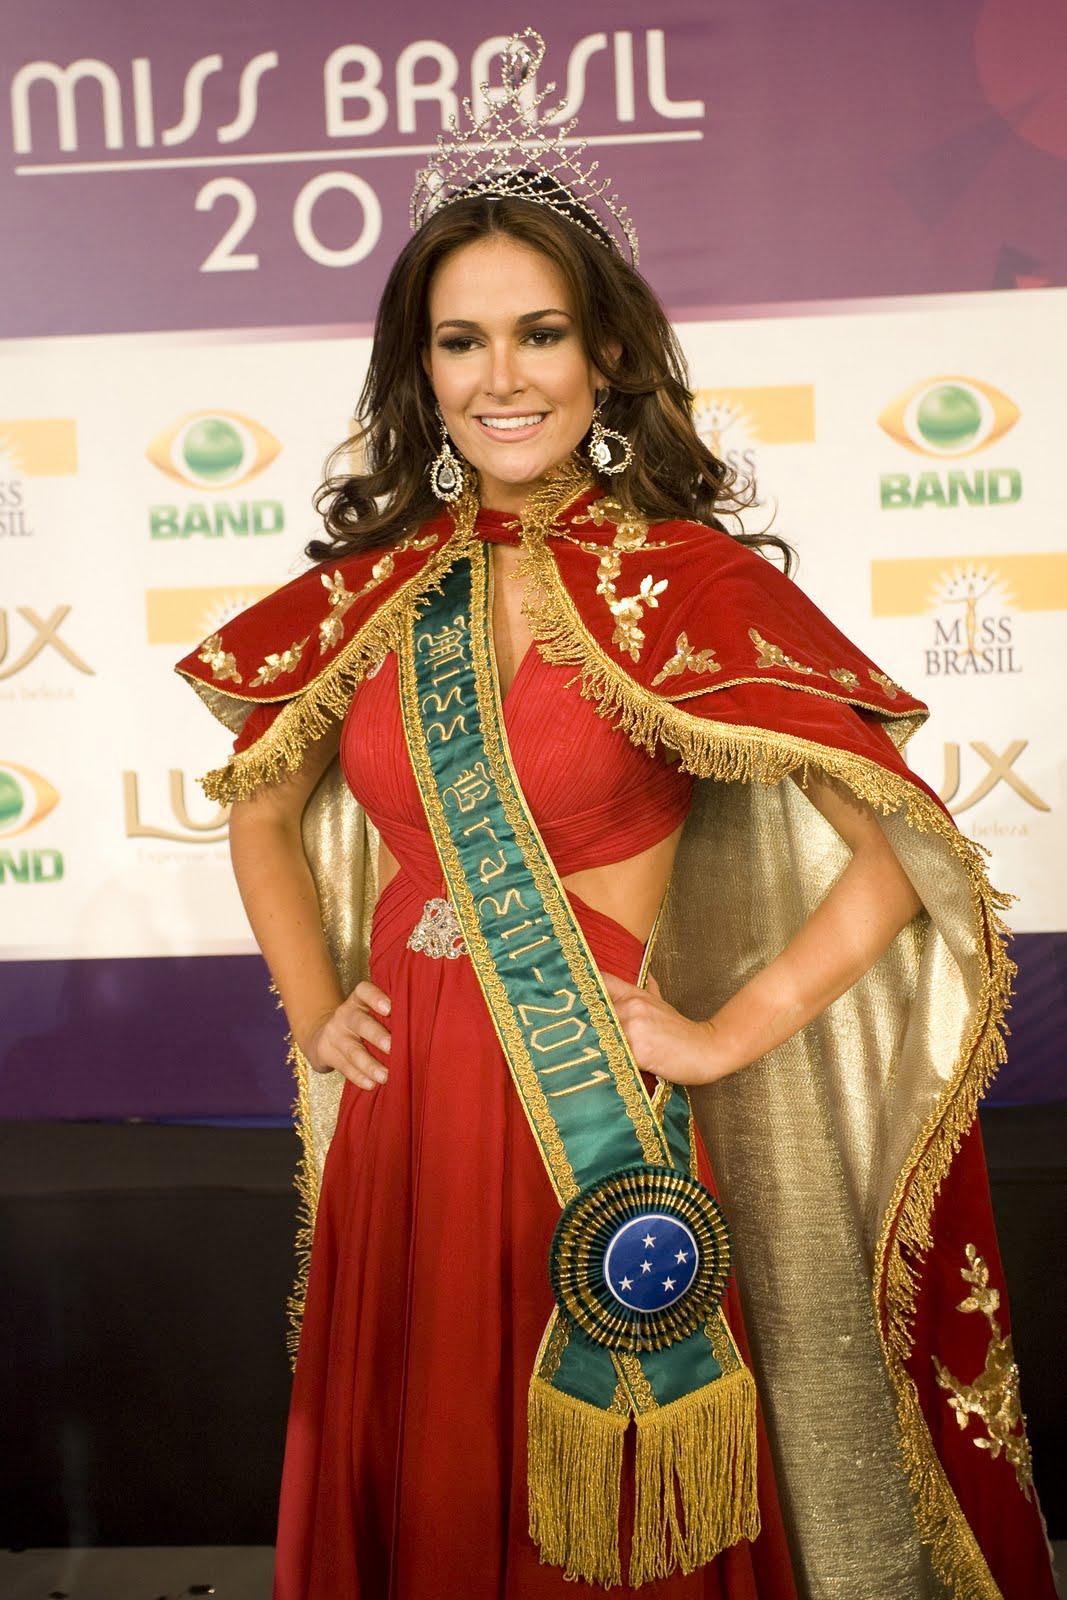 priscila machado, miss brasil 2011. Xvn7qbh5